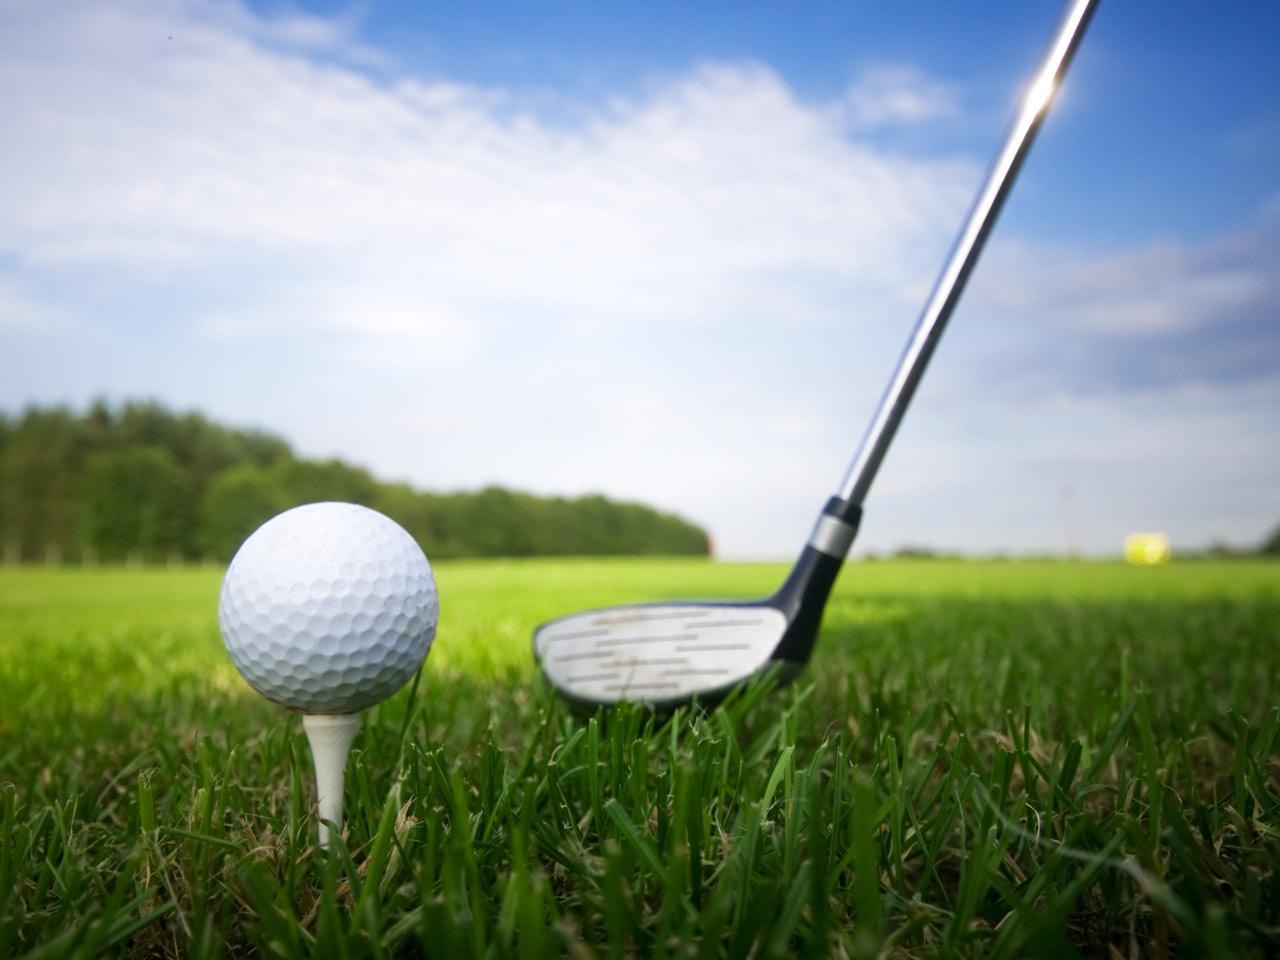 Information Golf Pictures Golf Club Ball HD Desktop Wallpapers 1280x960